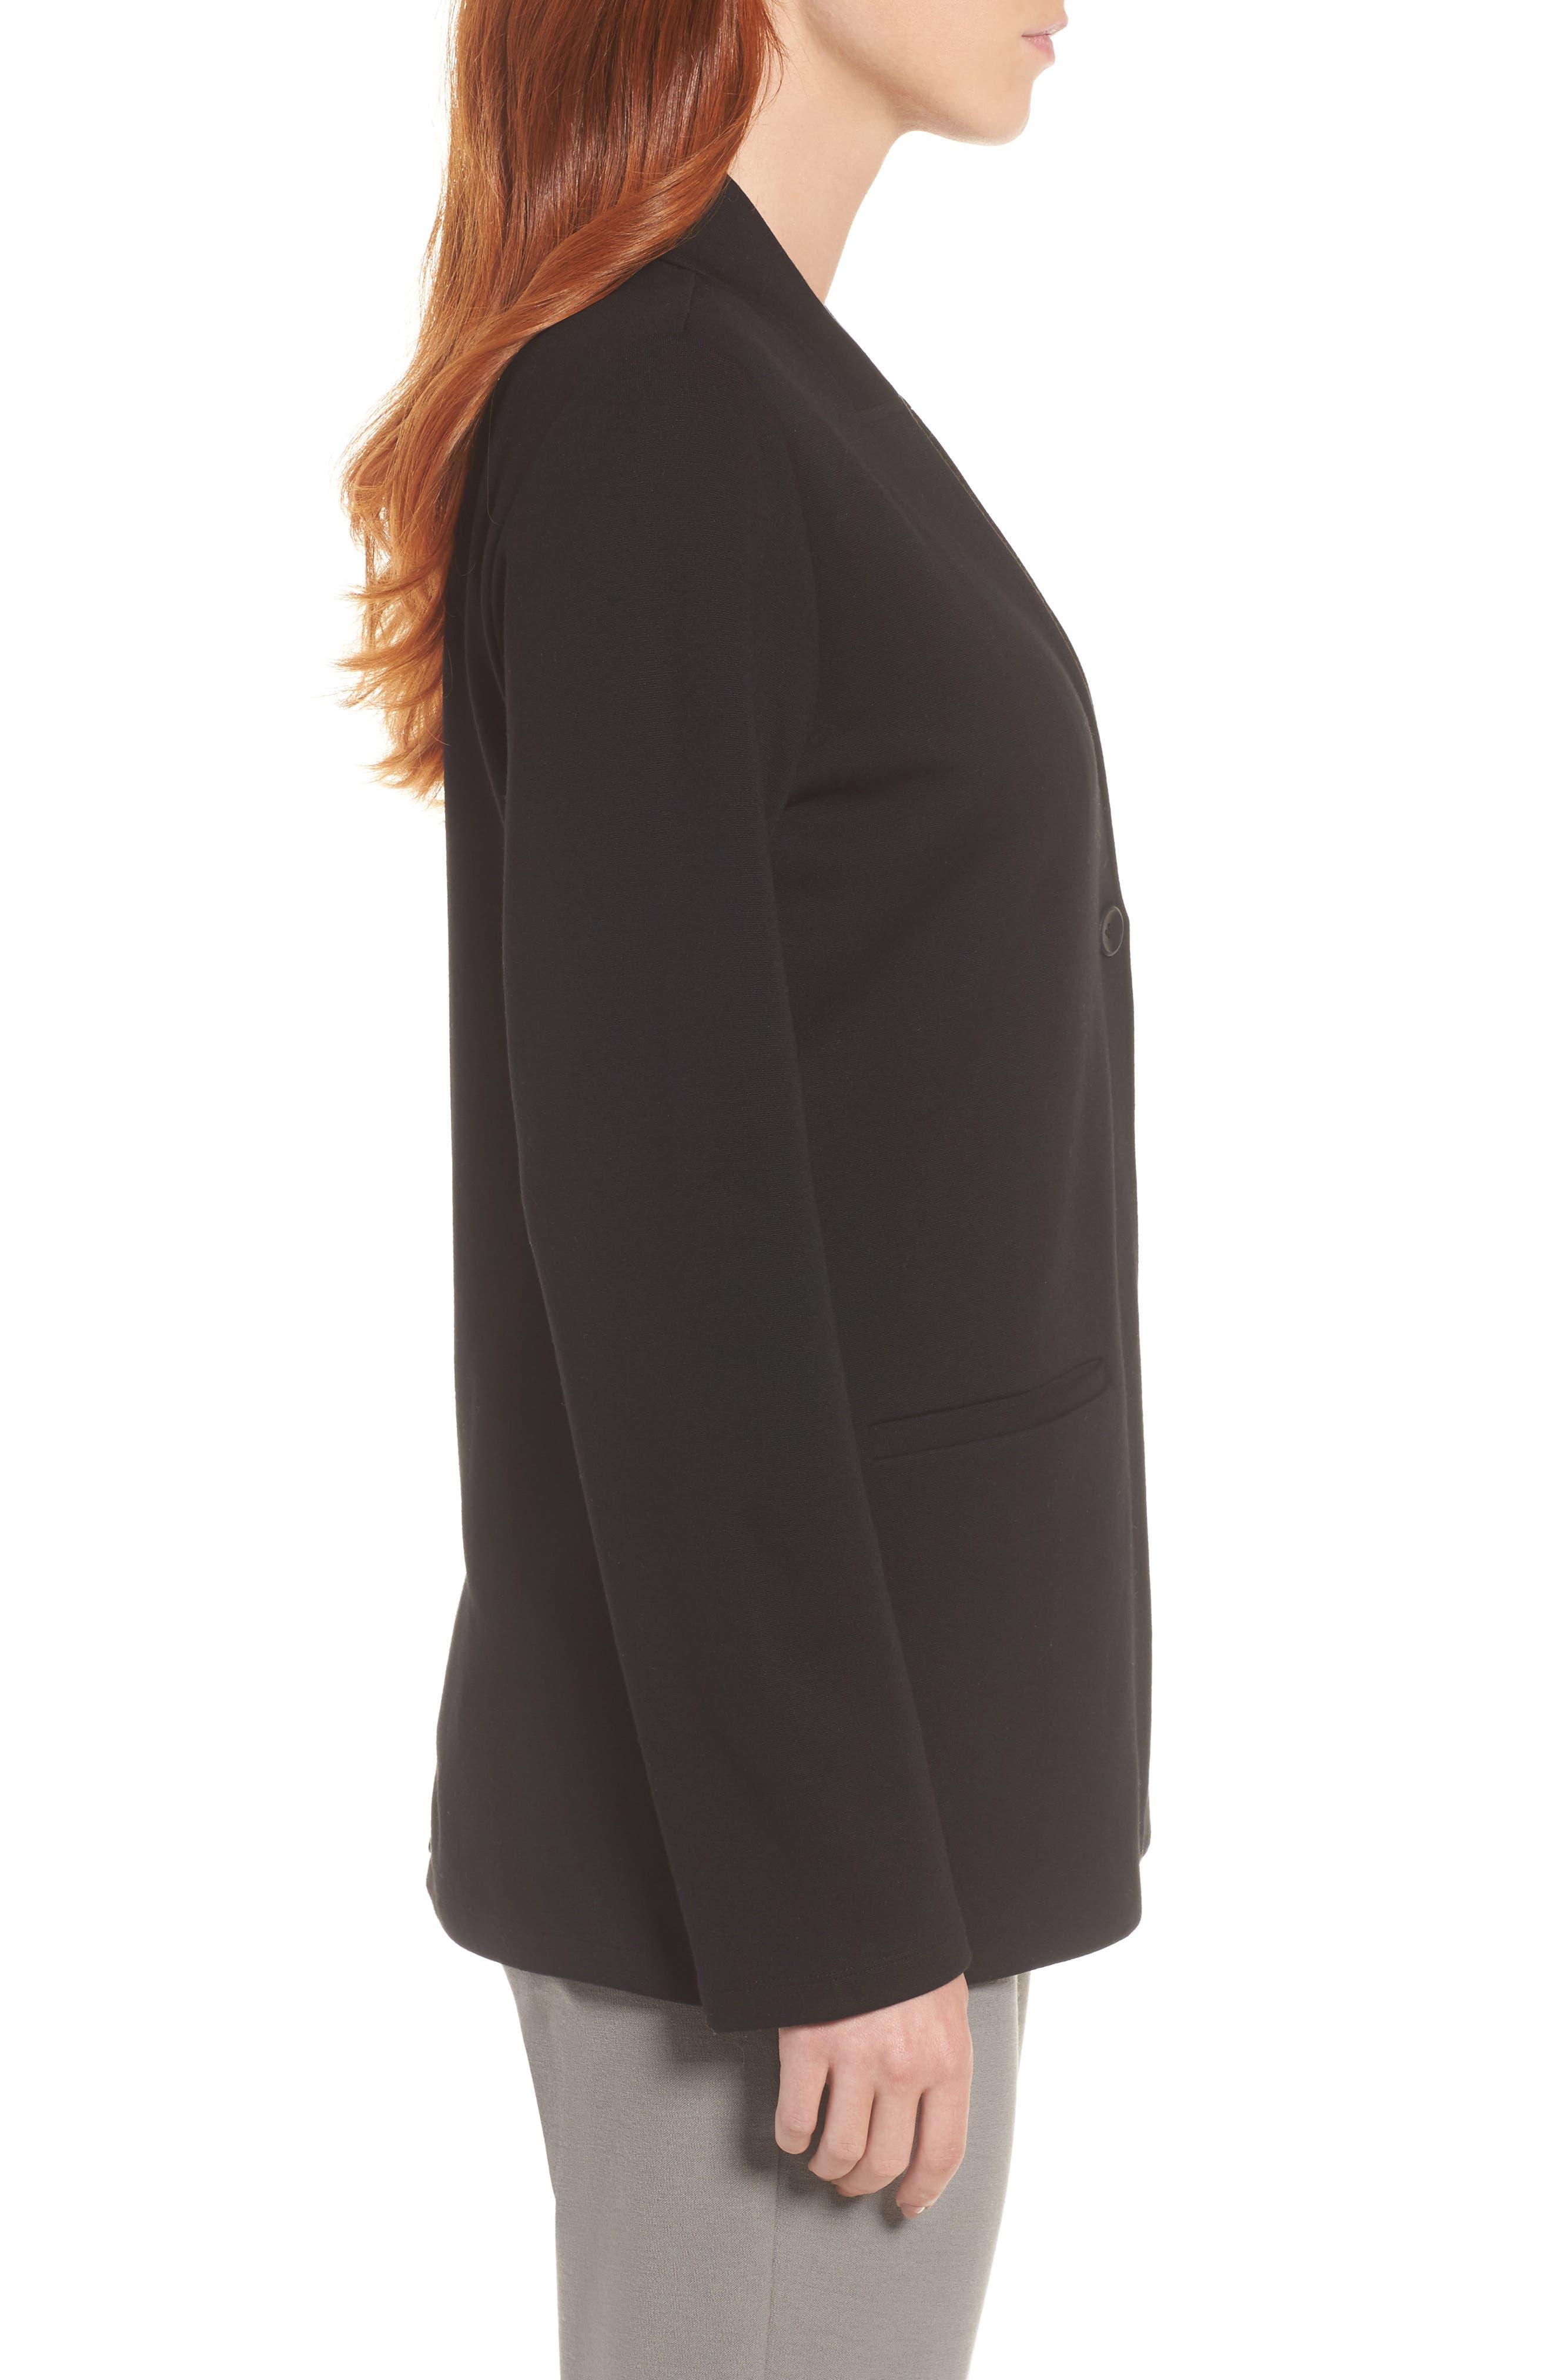 Tencel<sup>®</sup> Lyocell Blend Knit Blazer,                             Alternate thumbnail 3, color,                             Black